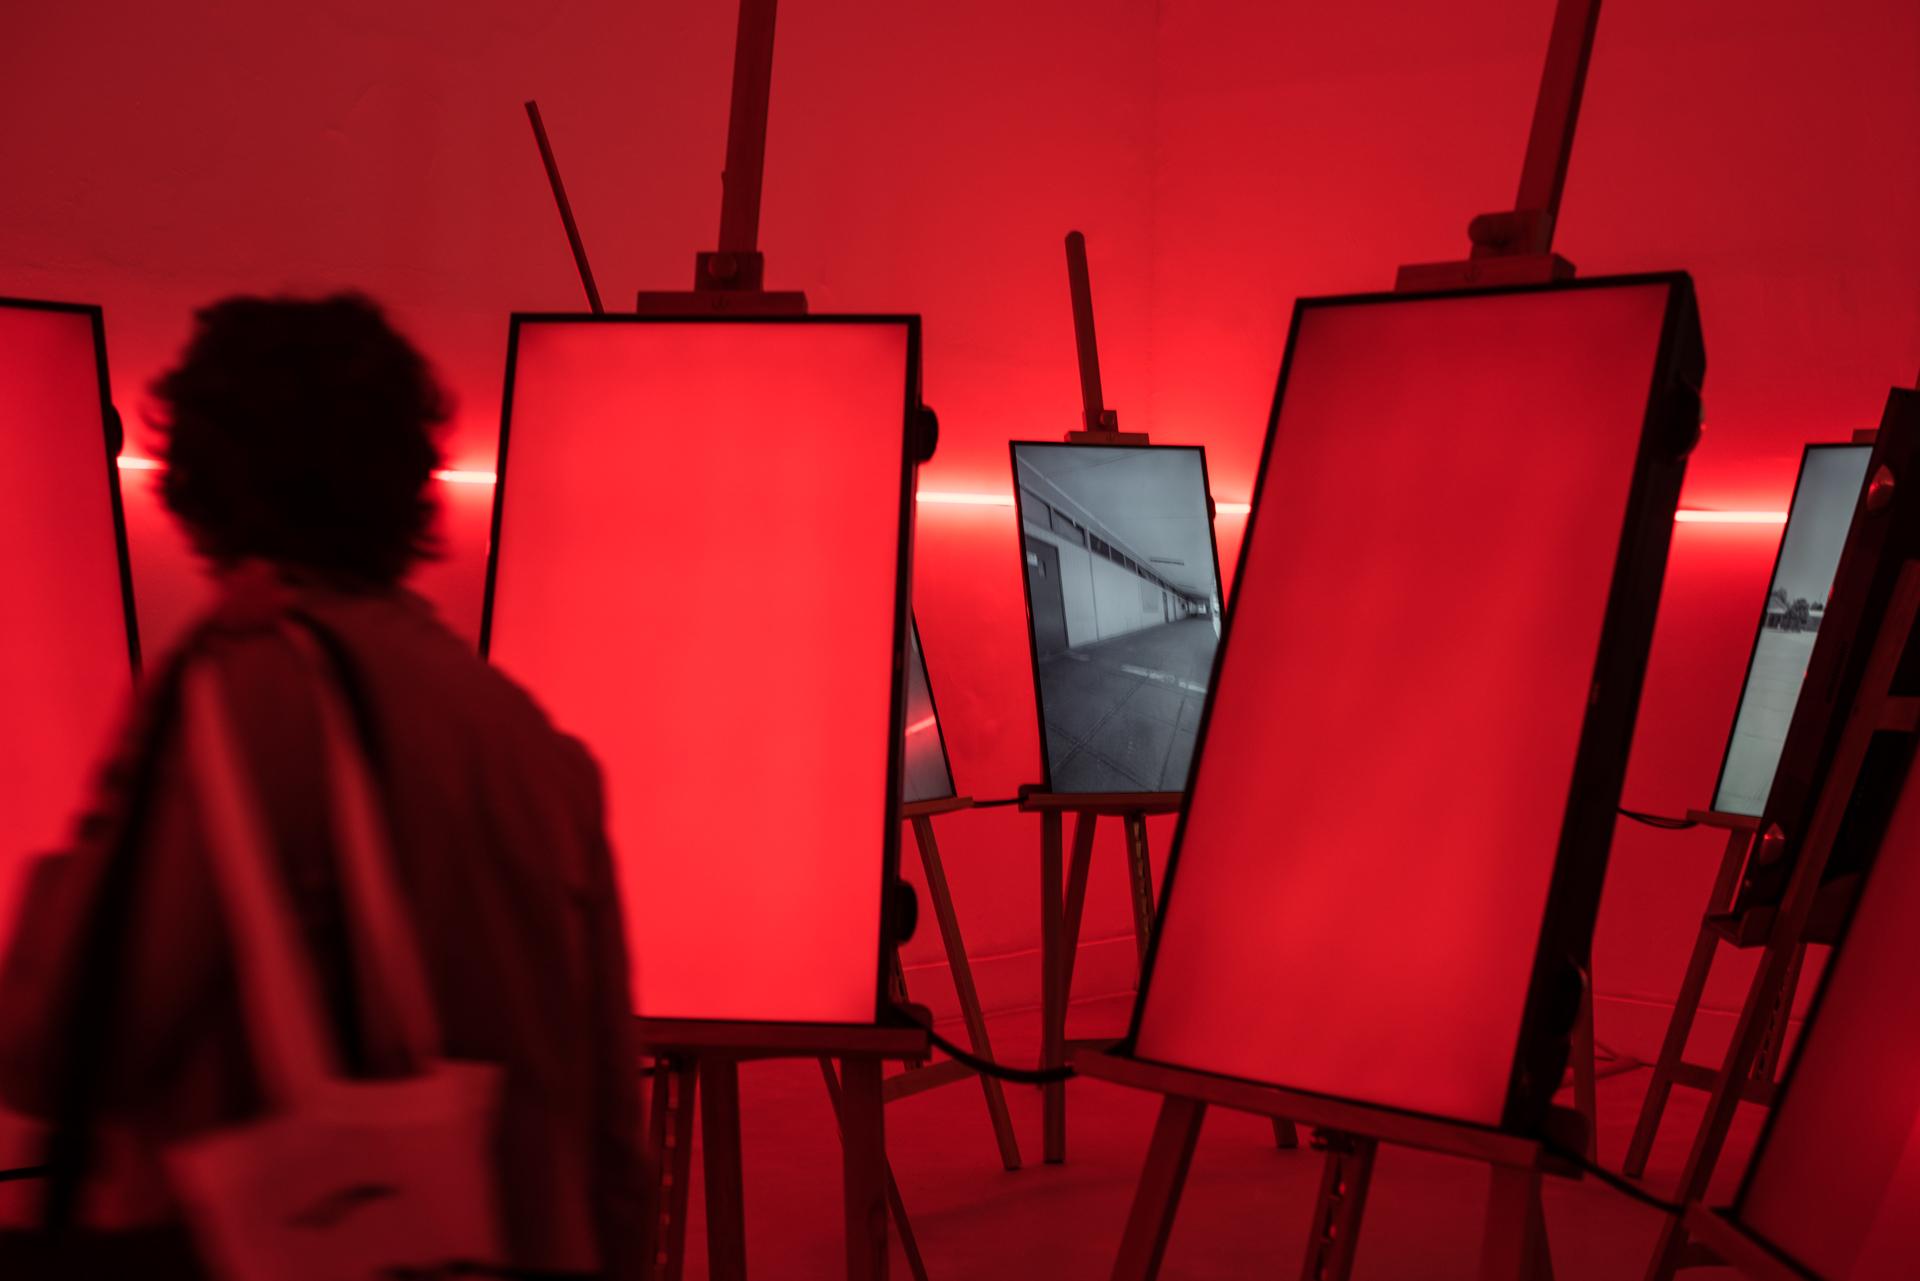 ANDES SHADOW La Biennale di Venezia 2016 © Gonzalo Puga-7707